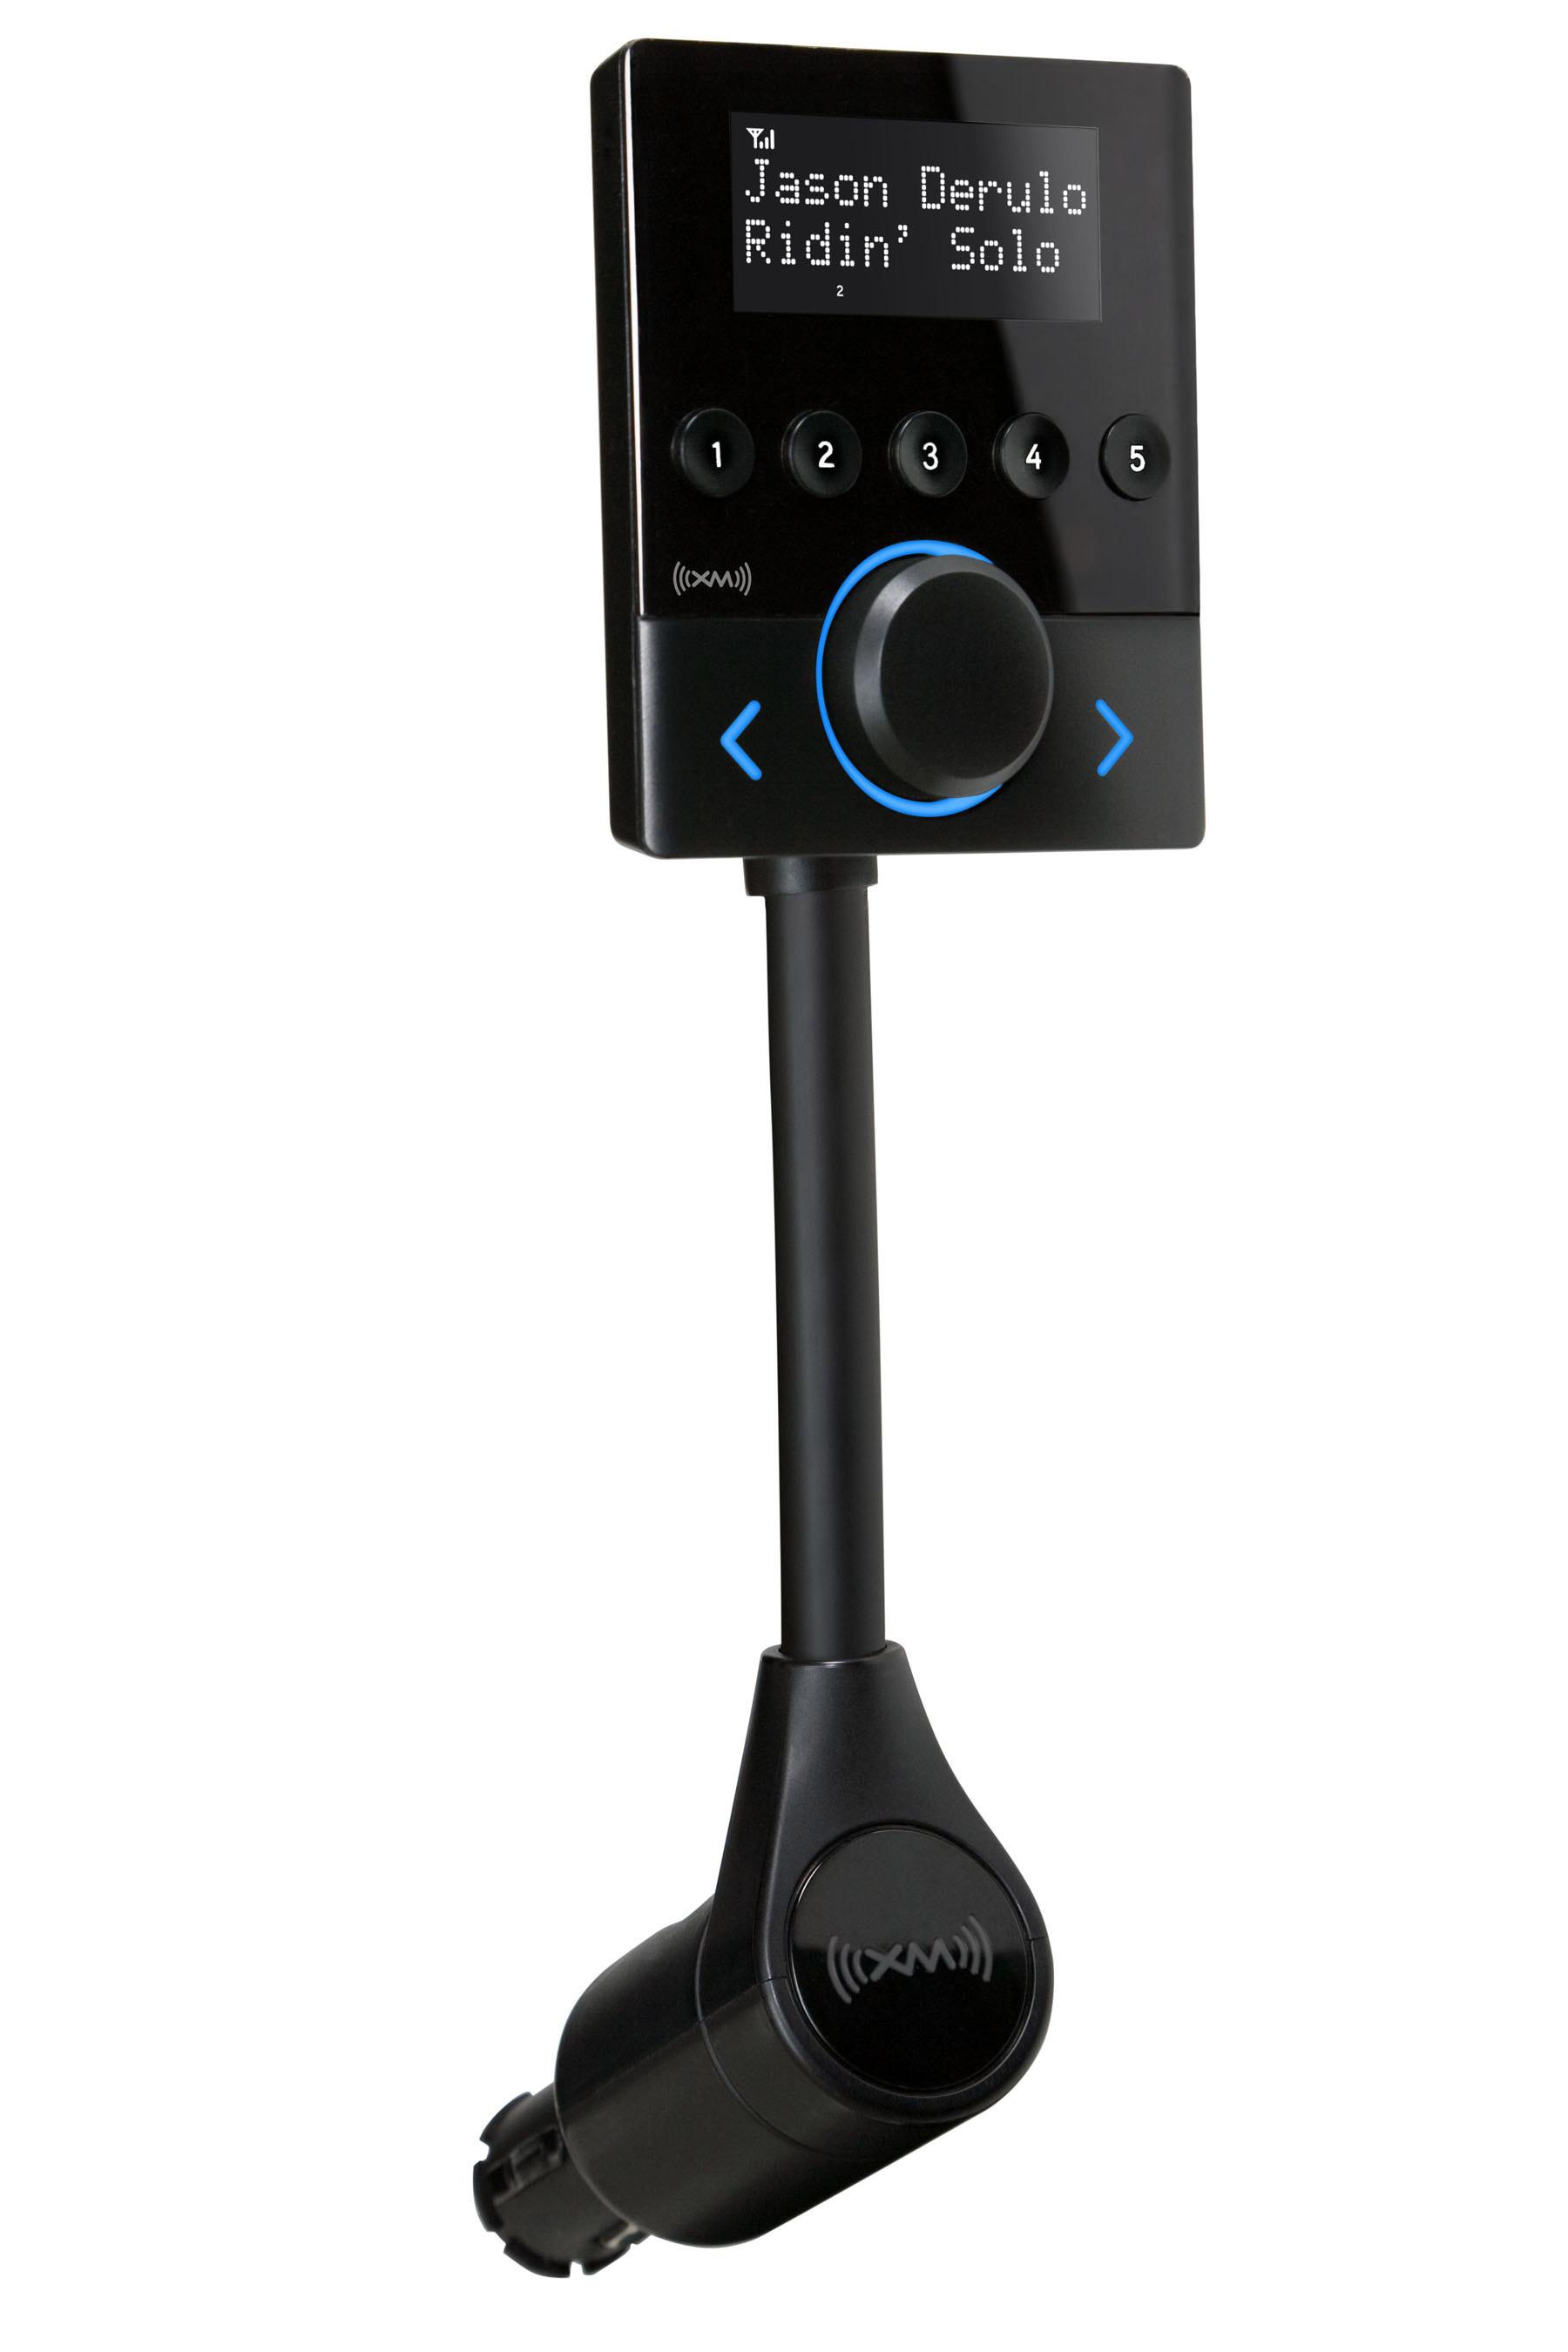 Sirius XM offers XM Snap Satellite Radio for your car